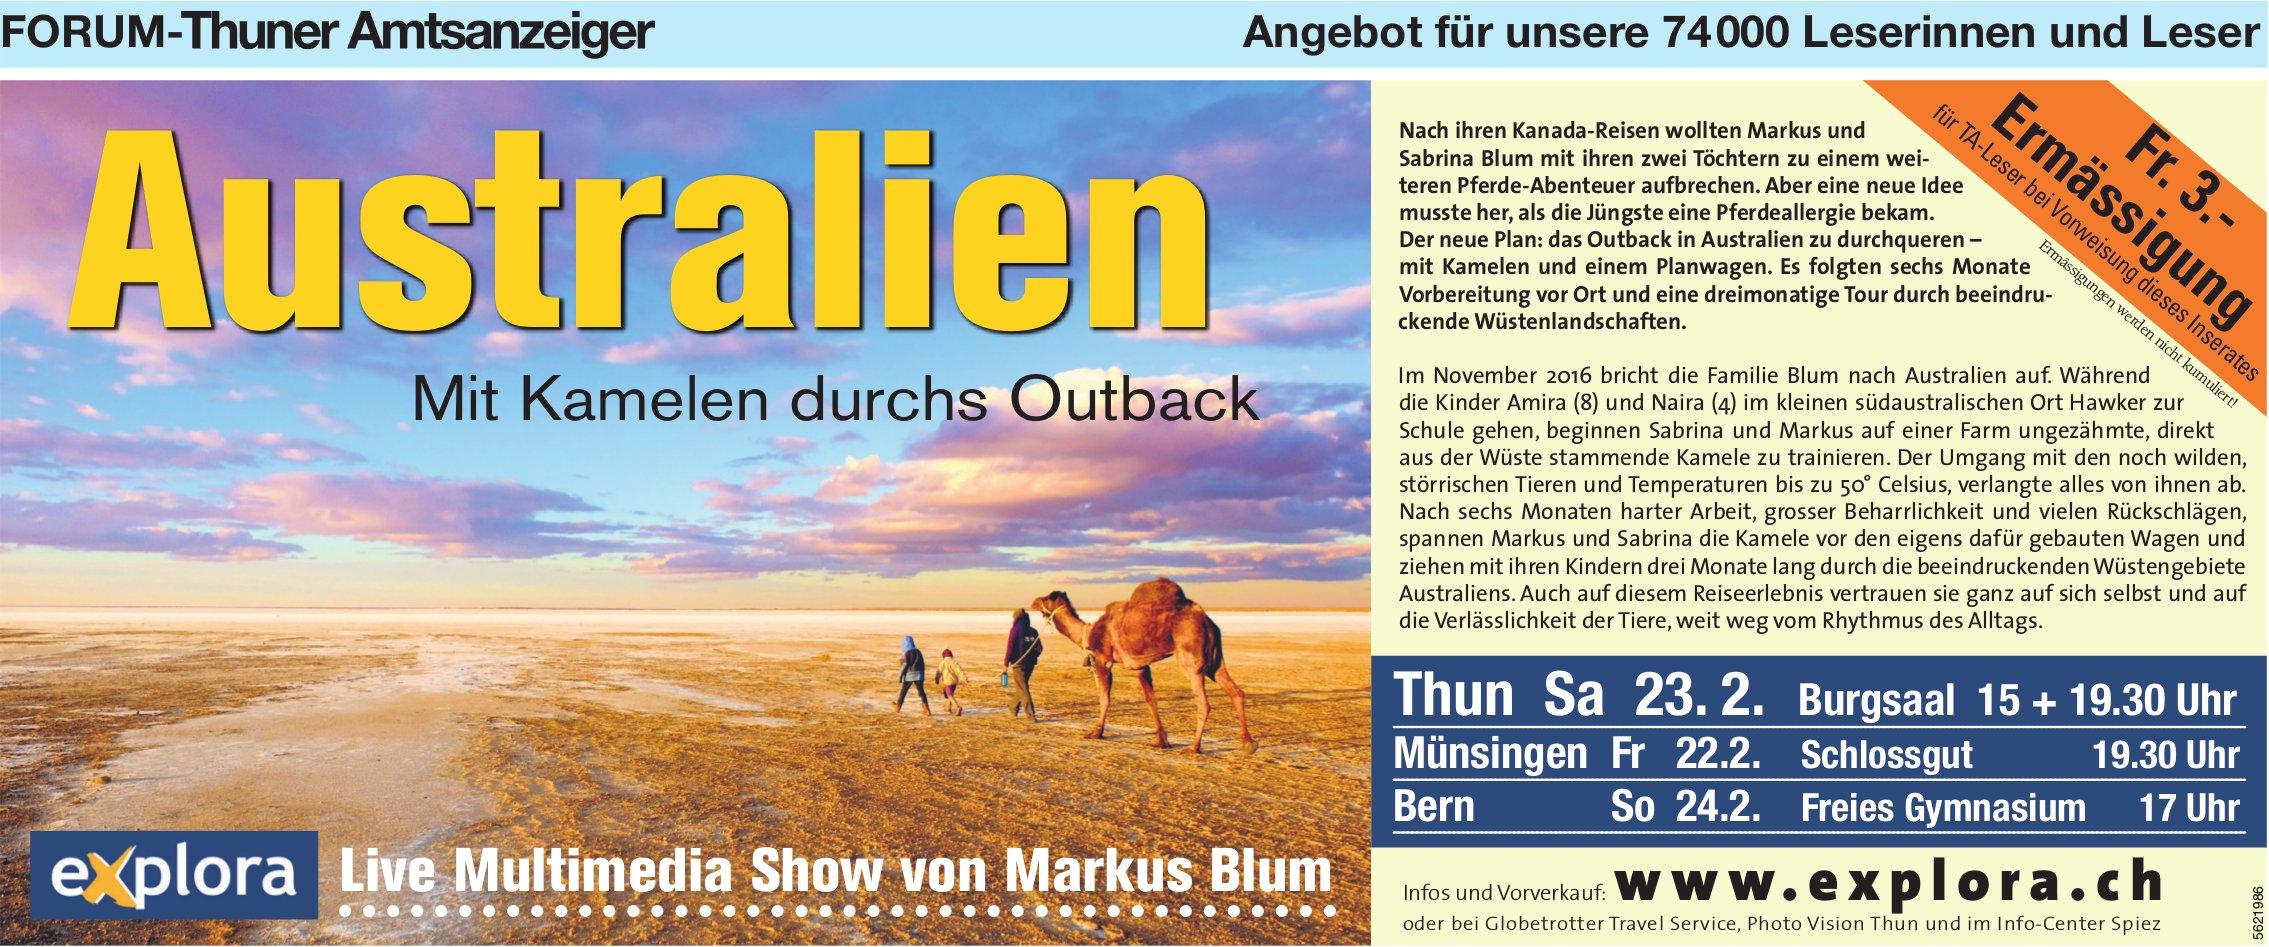 Forum-Thuner Amtsanzeiger - Australien mit Kamelen durchs Outback: Live Multimedia Show, 23. Feb.